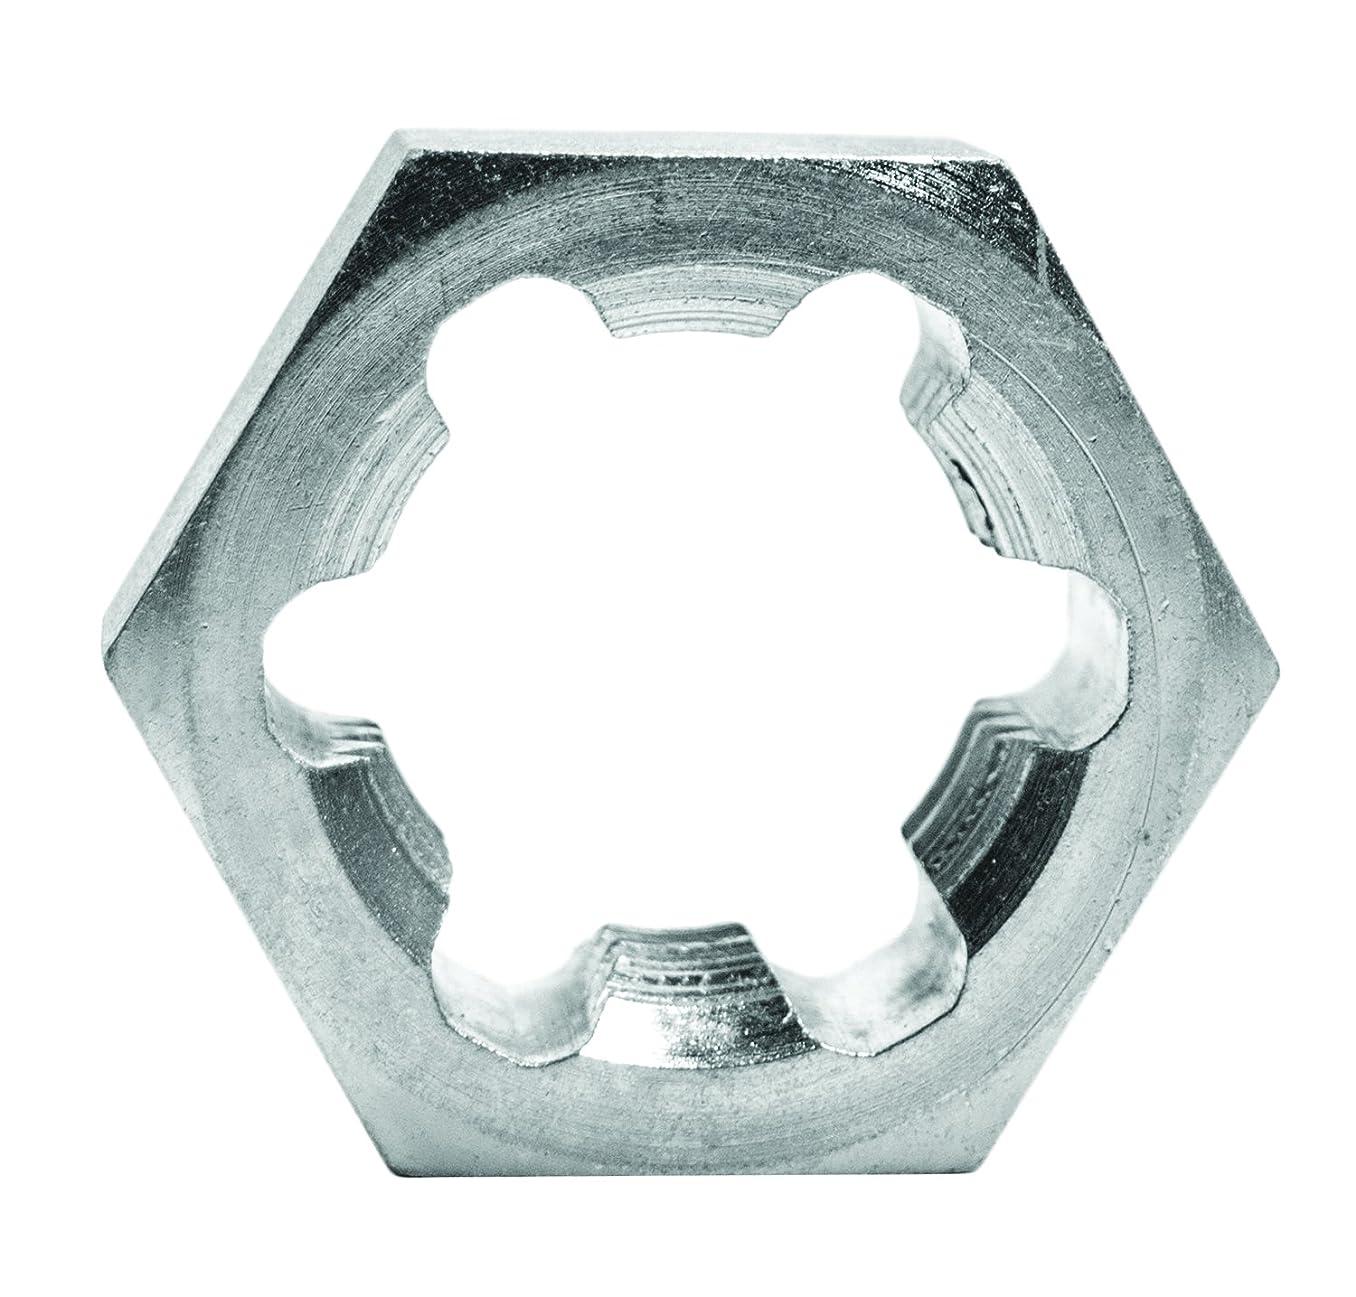 Century Drill & Tool 92923 Right Hand Rethreading Hexagon Die, 1-1/4-7 NC